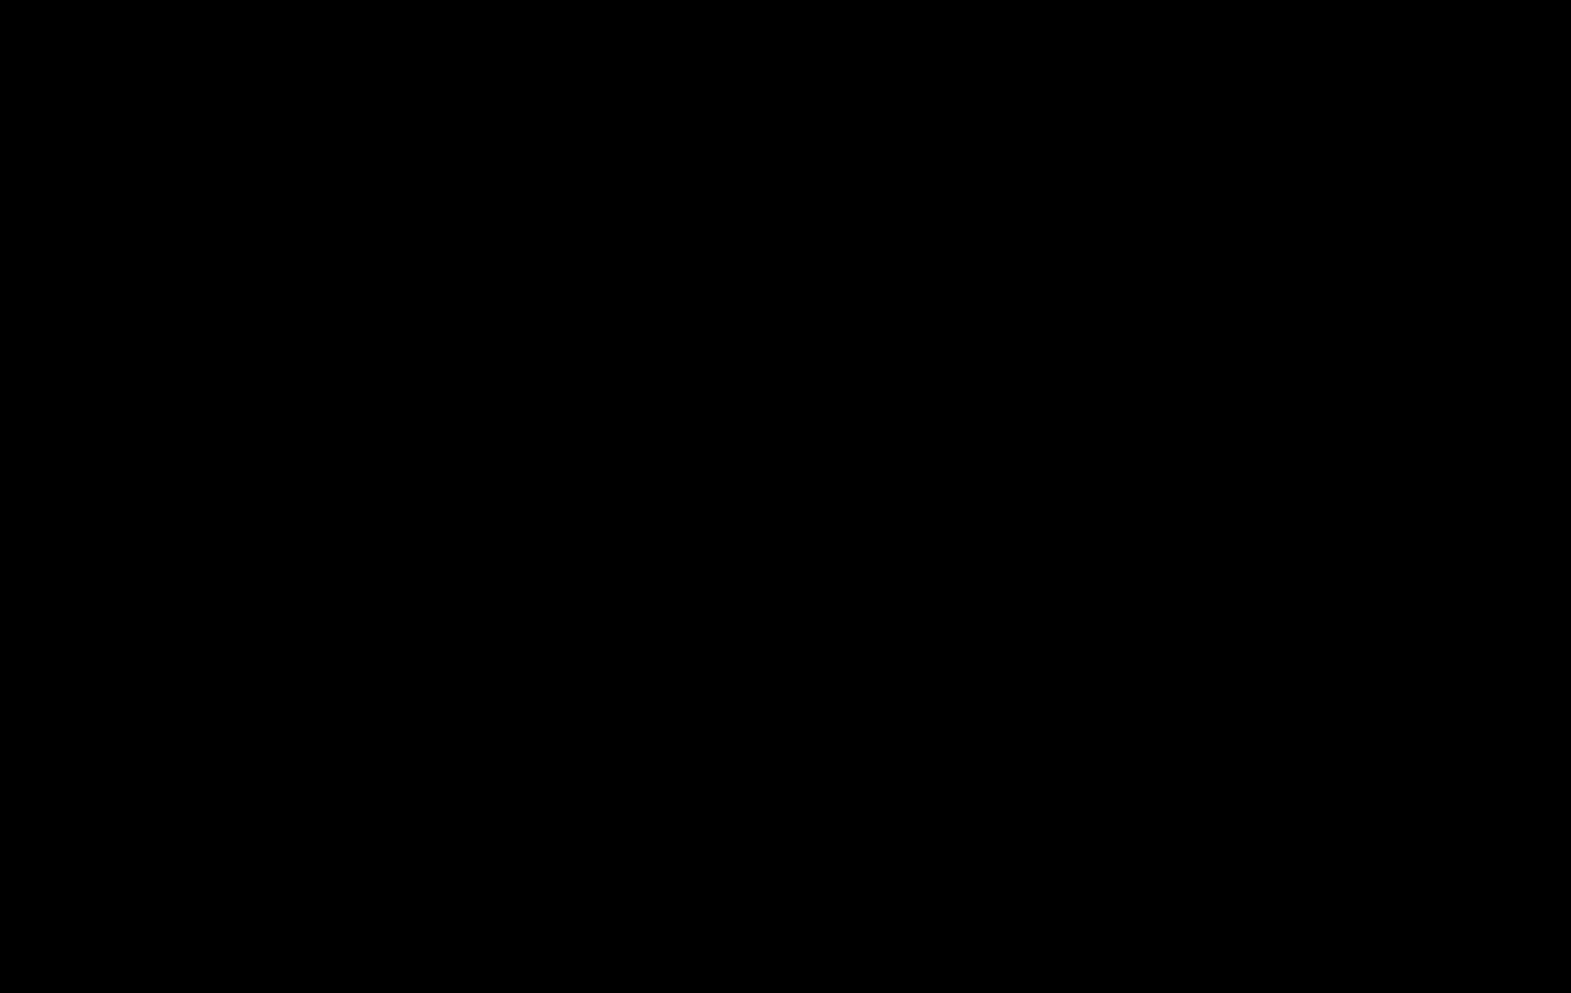 4-Nitrophenyl 6'-Deoxy-6'-(2-pyridylamino)-a-D-penta-(1-4)-glucopyranoside